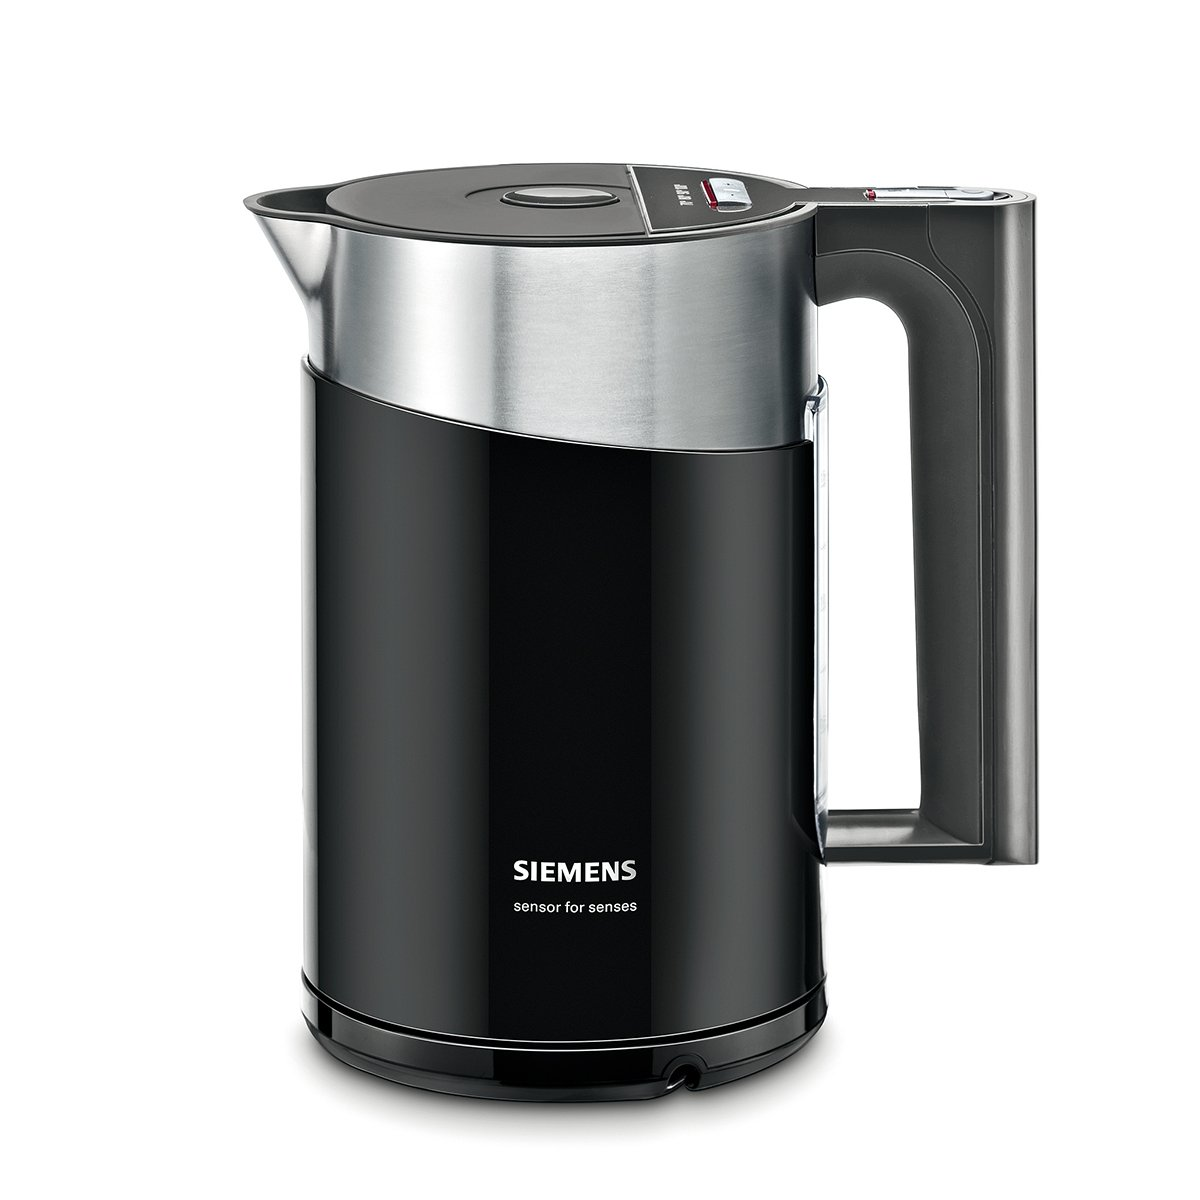 Siemens TW86103P - Hervidor eléctrico, 2400 W, 1.5 L, color negro